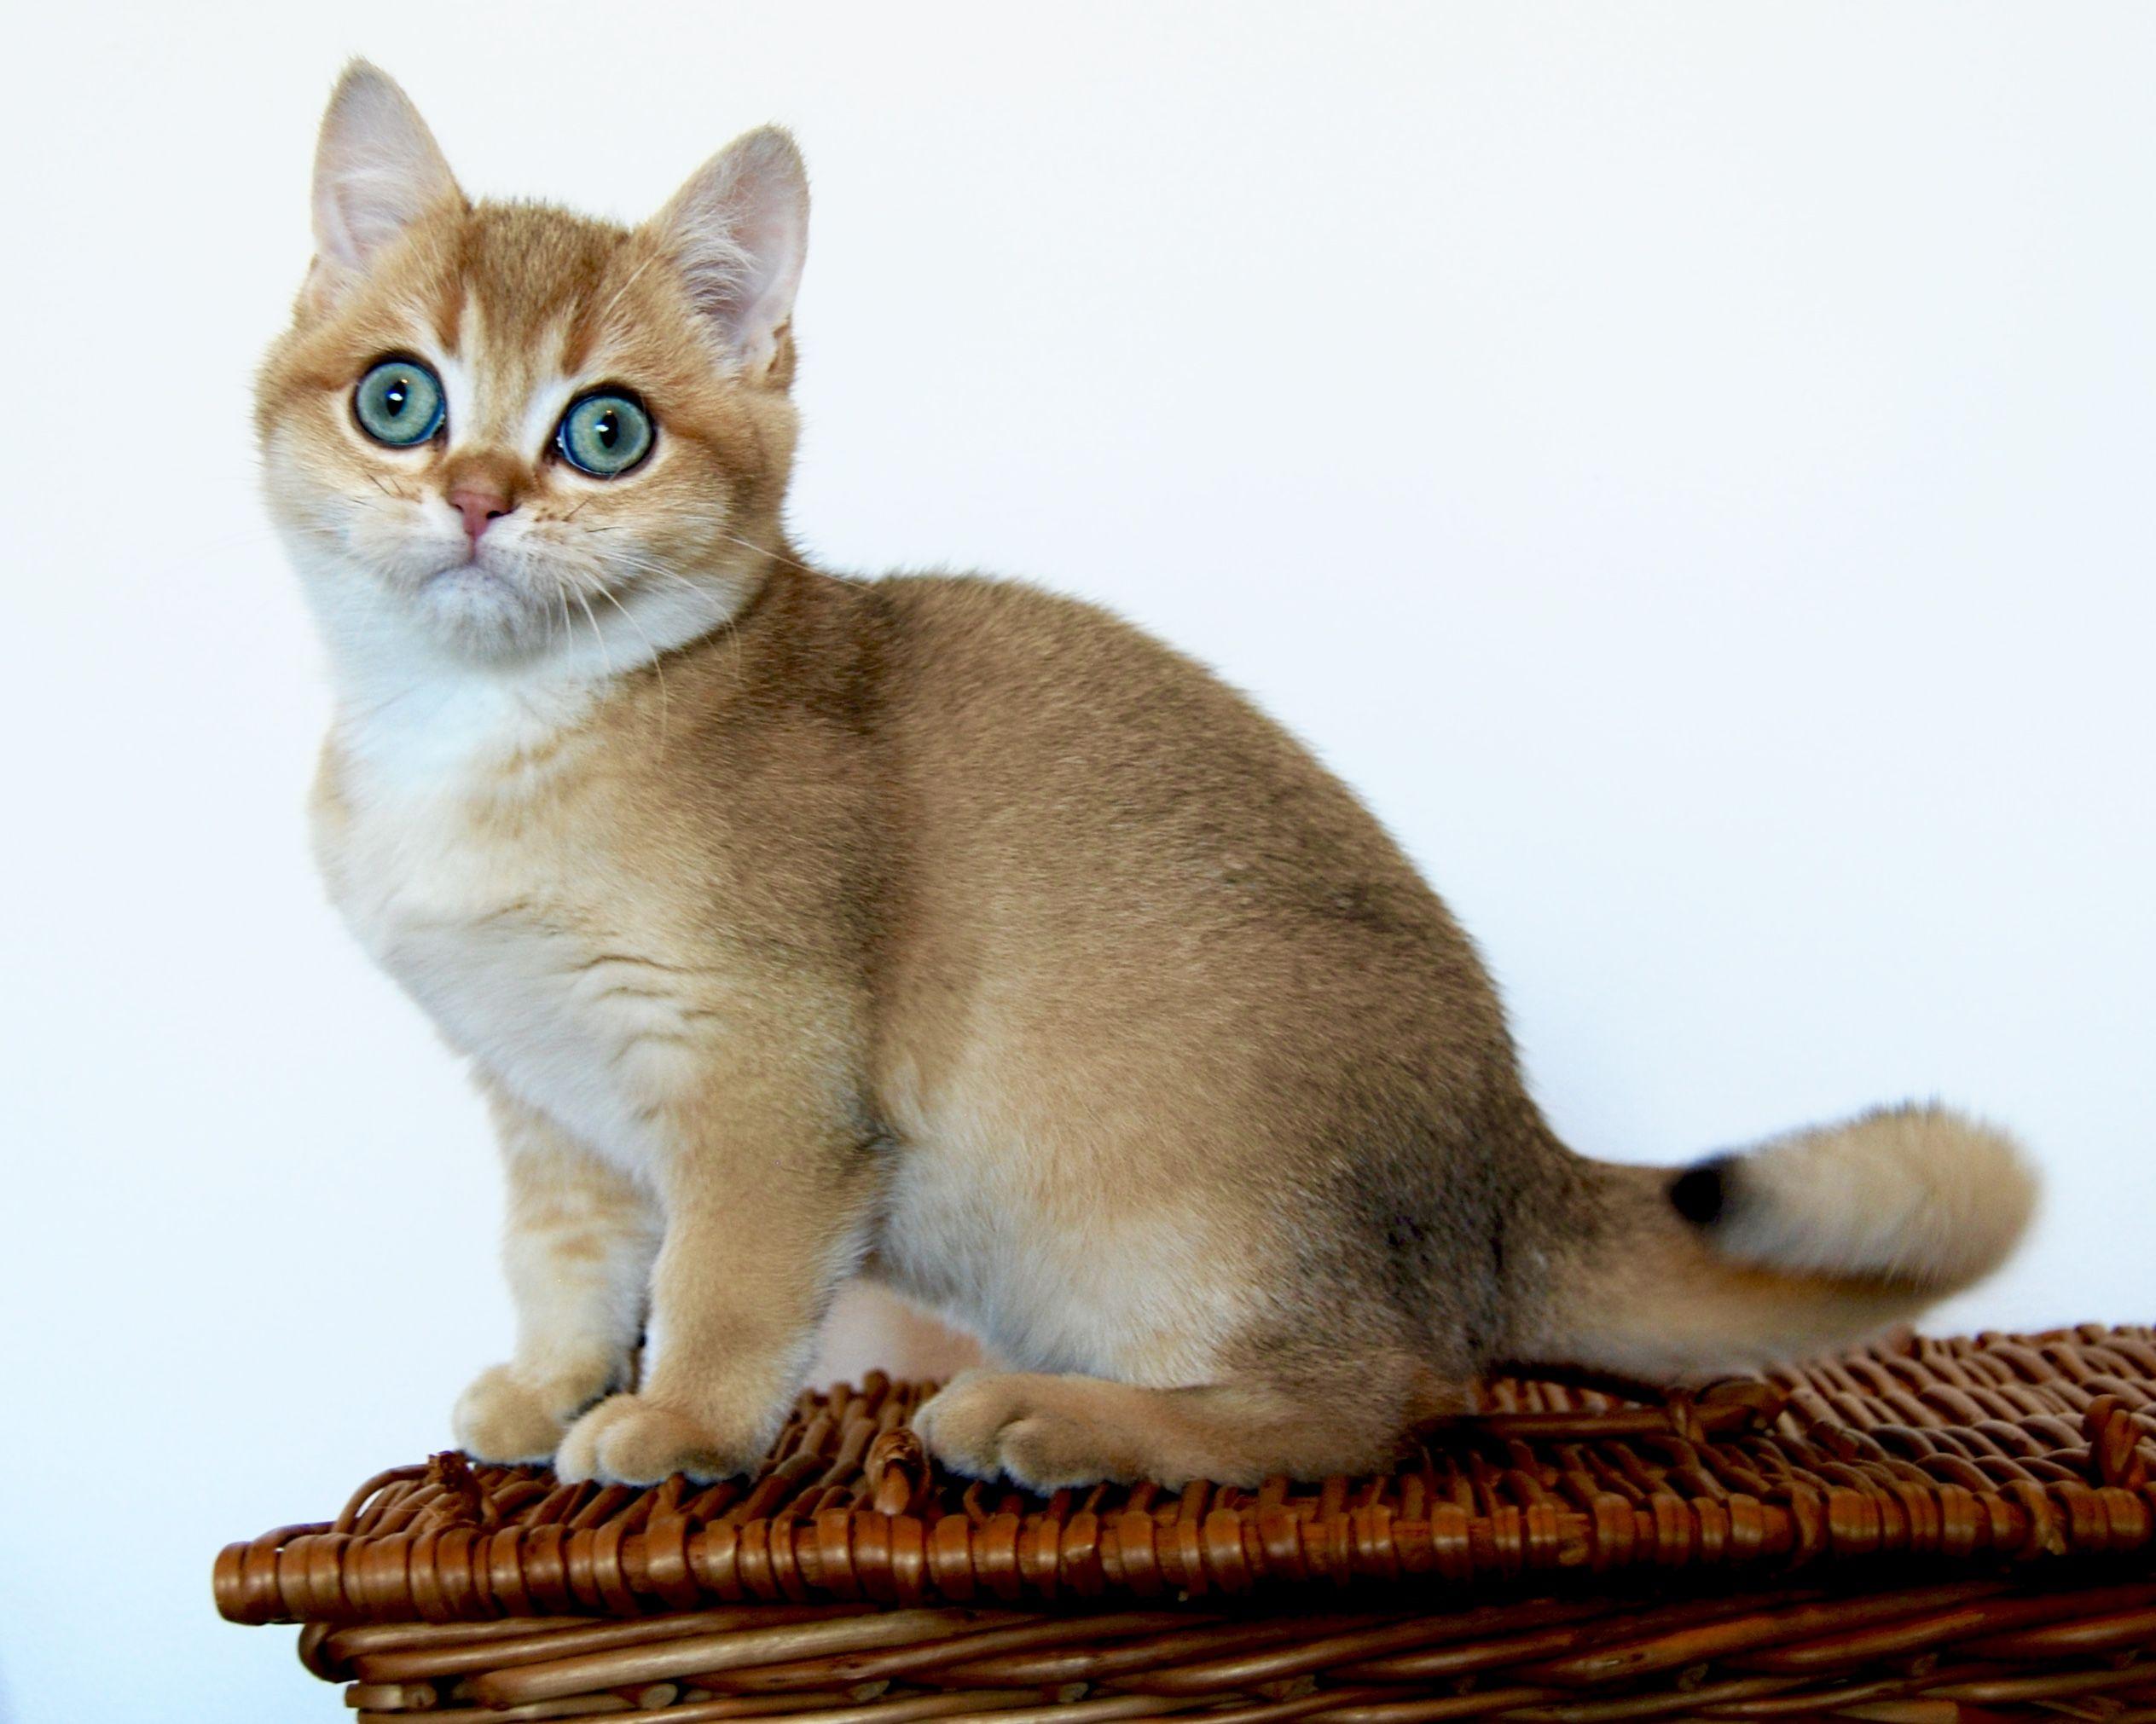 Golden Shaded Ny11 In 2020 Cats British Shorthair Cats British Shorthair Kittens